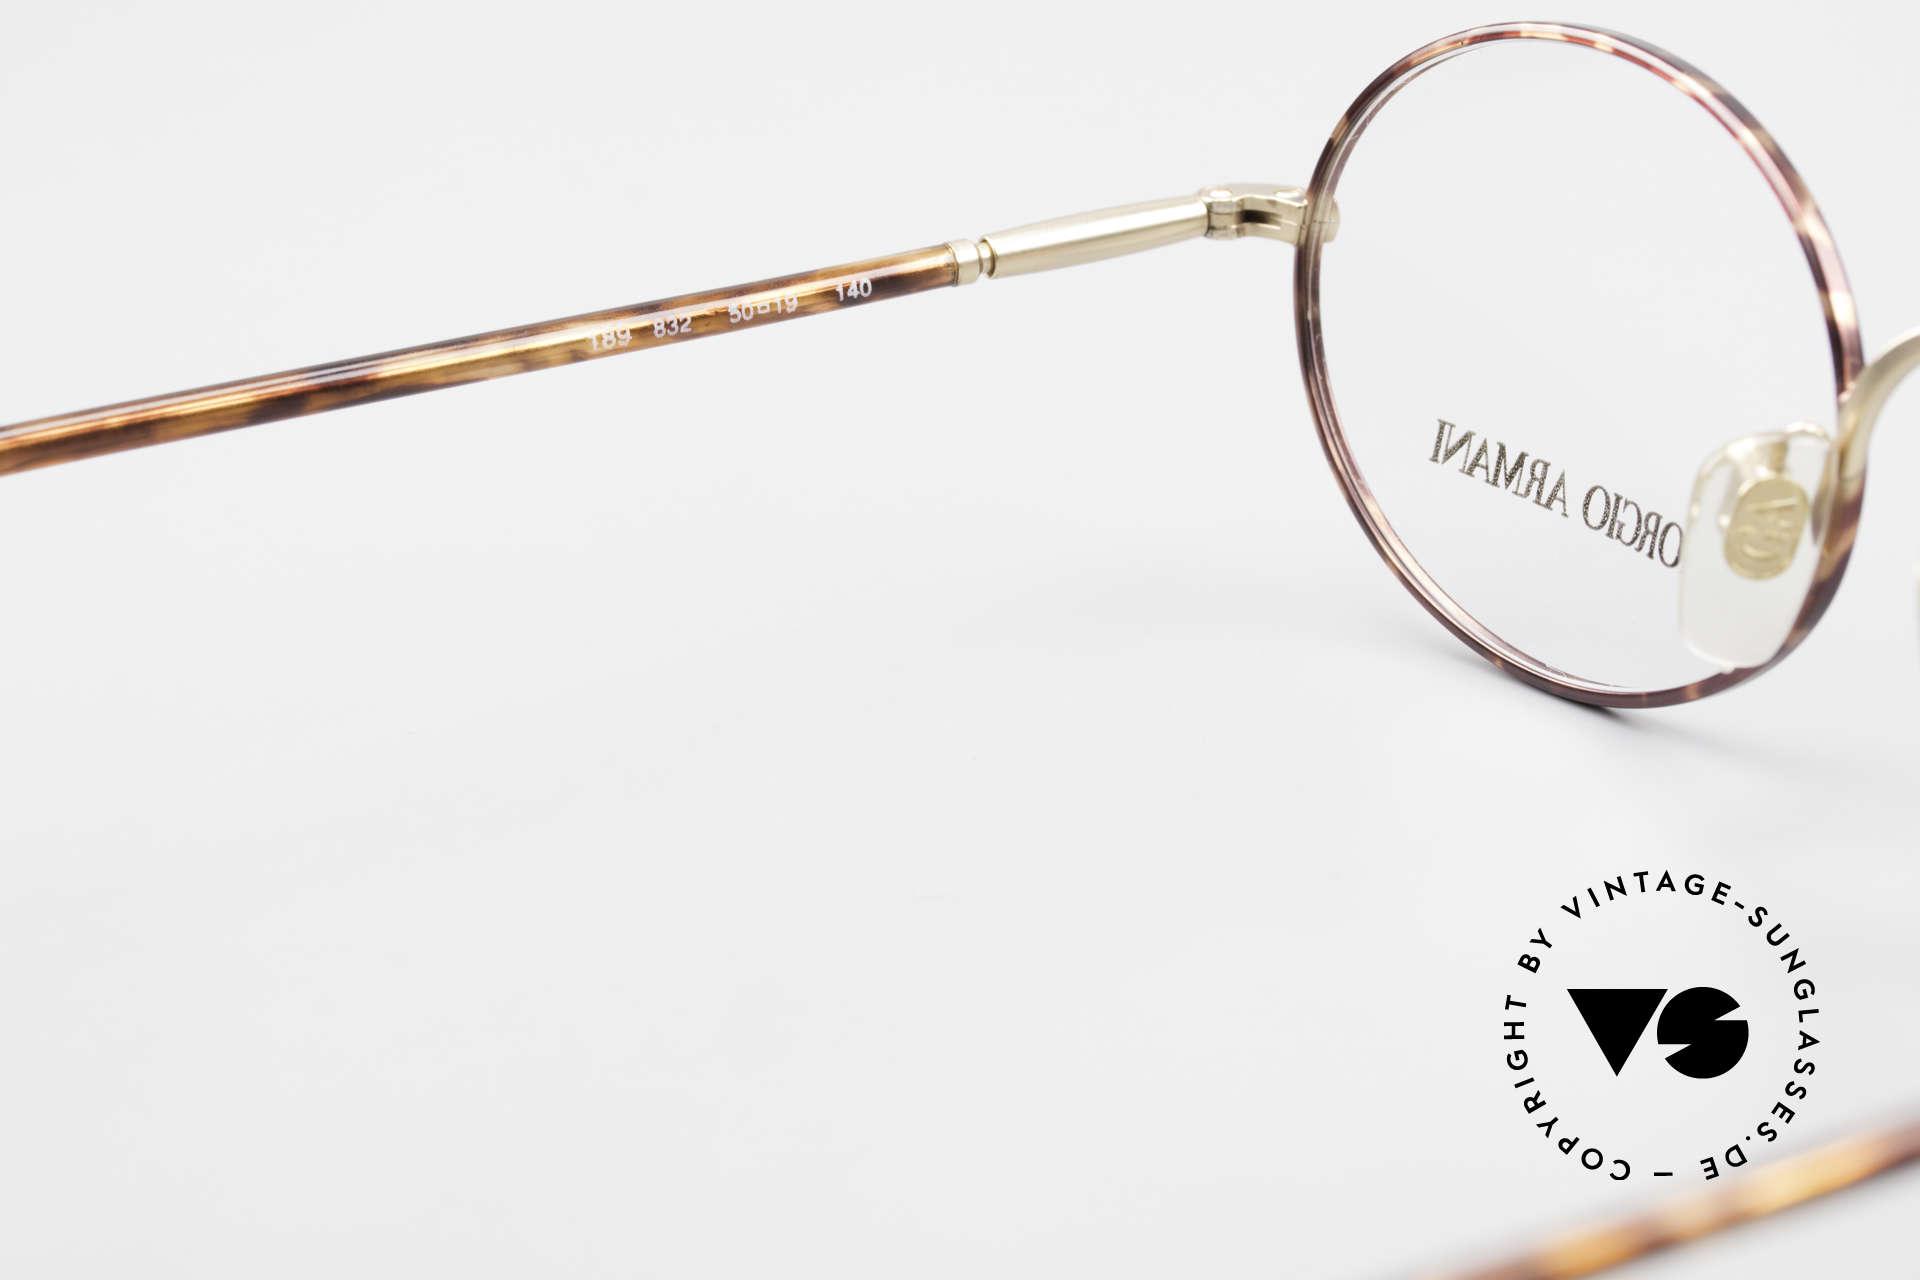 Giorgio Armani 189 Classic Oval Designer Frame, DEMO lenses should be replaced with prescriptions, Made for Men